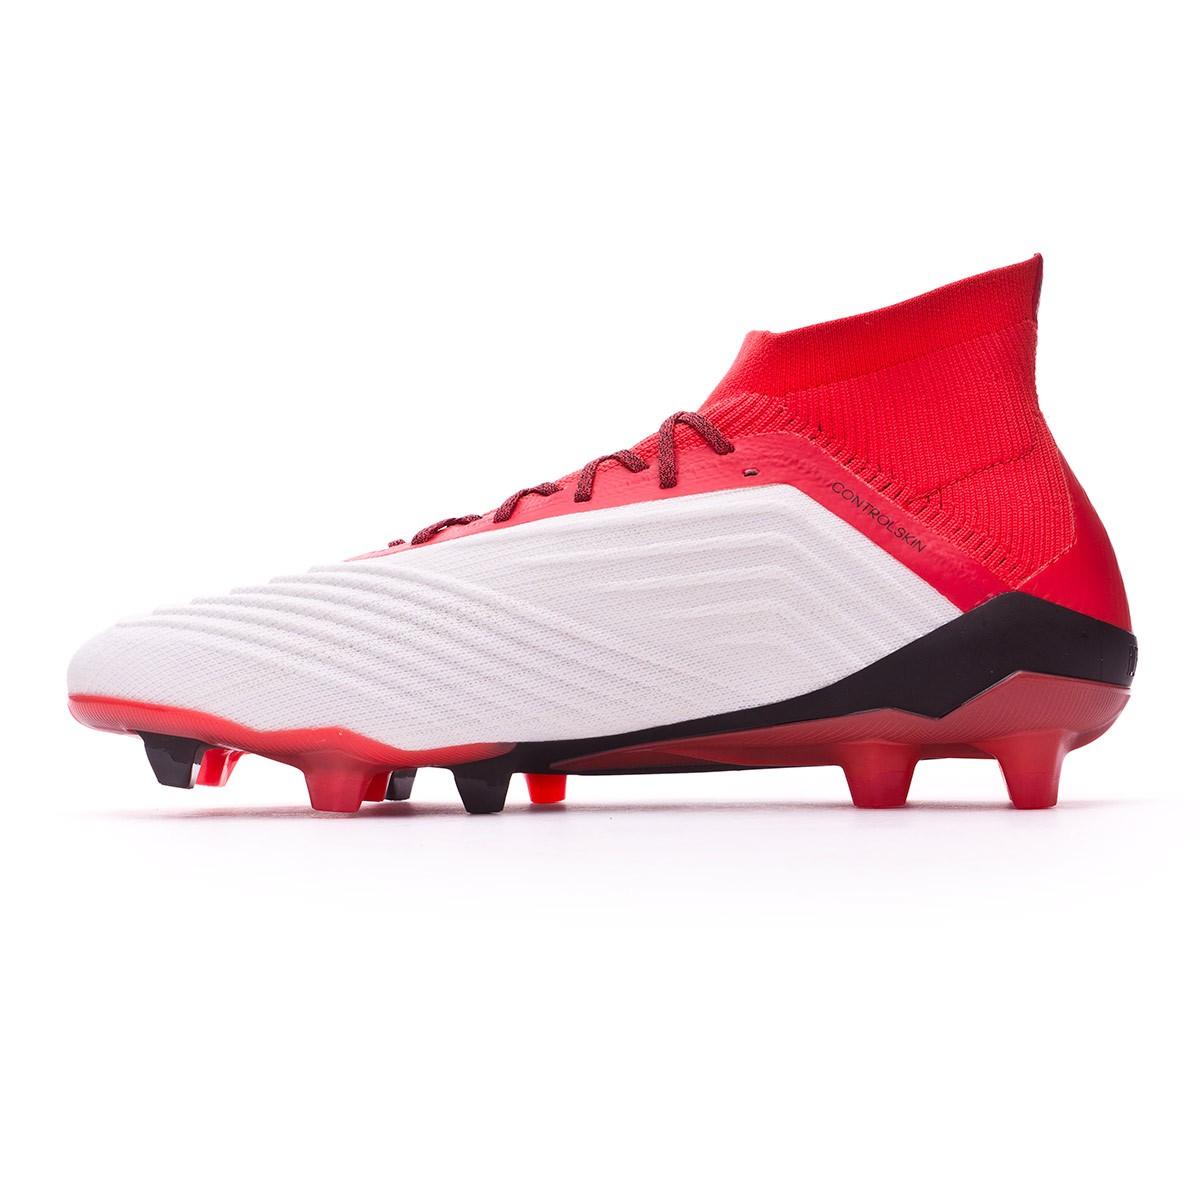 outlet store 8c222 5d707 Football Boots adidas Predator 18.1 FG White-Core black-Real coral - Tienda  de fútbol Fútbol Emotion